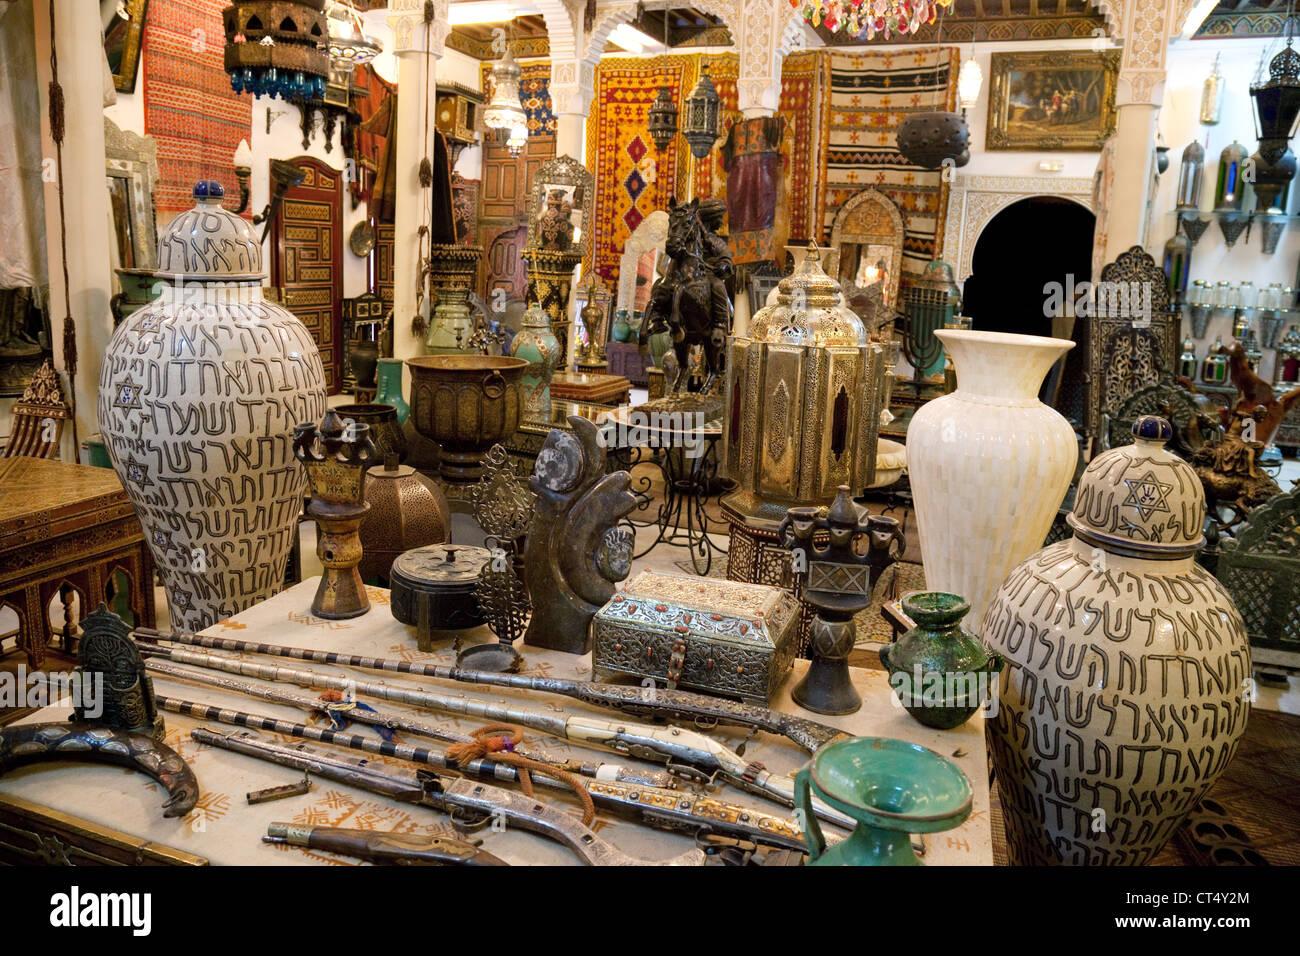 Craft Shop Interior Stock Photos Craft Shop Interior Stock Images